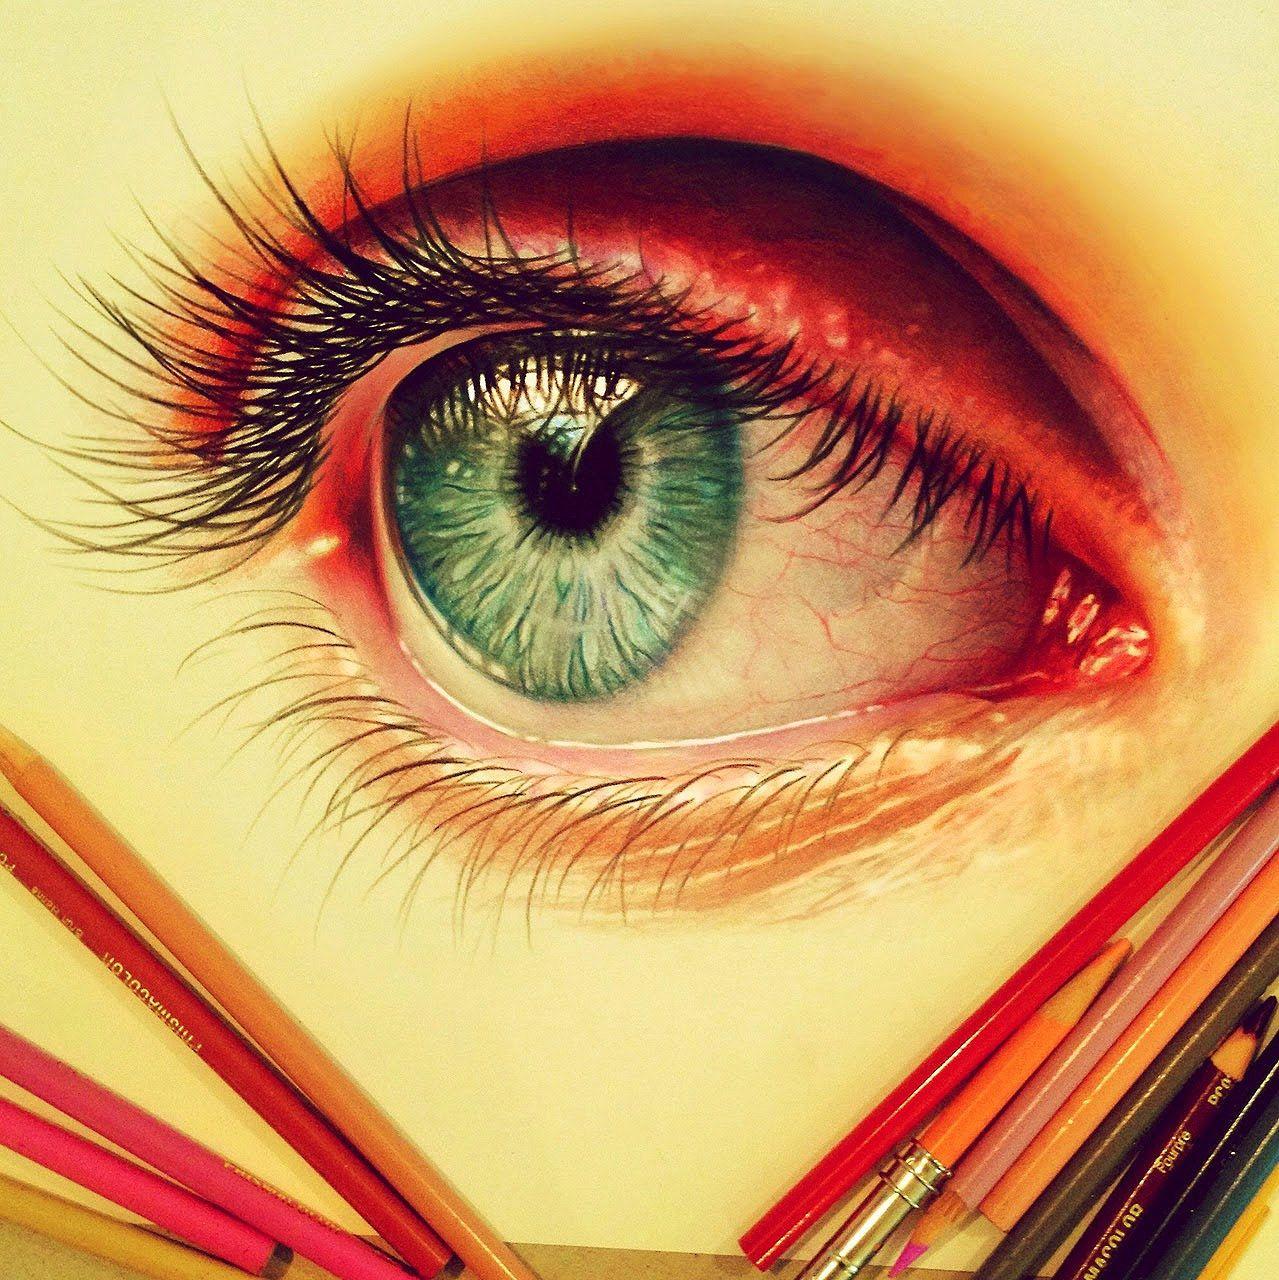 Realistic Pencil Drawings By Morgan Davidson Beautiful Drawings - Artist creates amazing hyper realistic 3d drawings